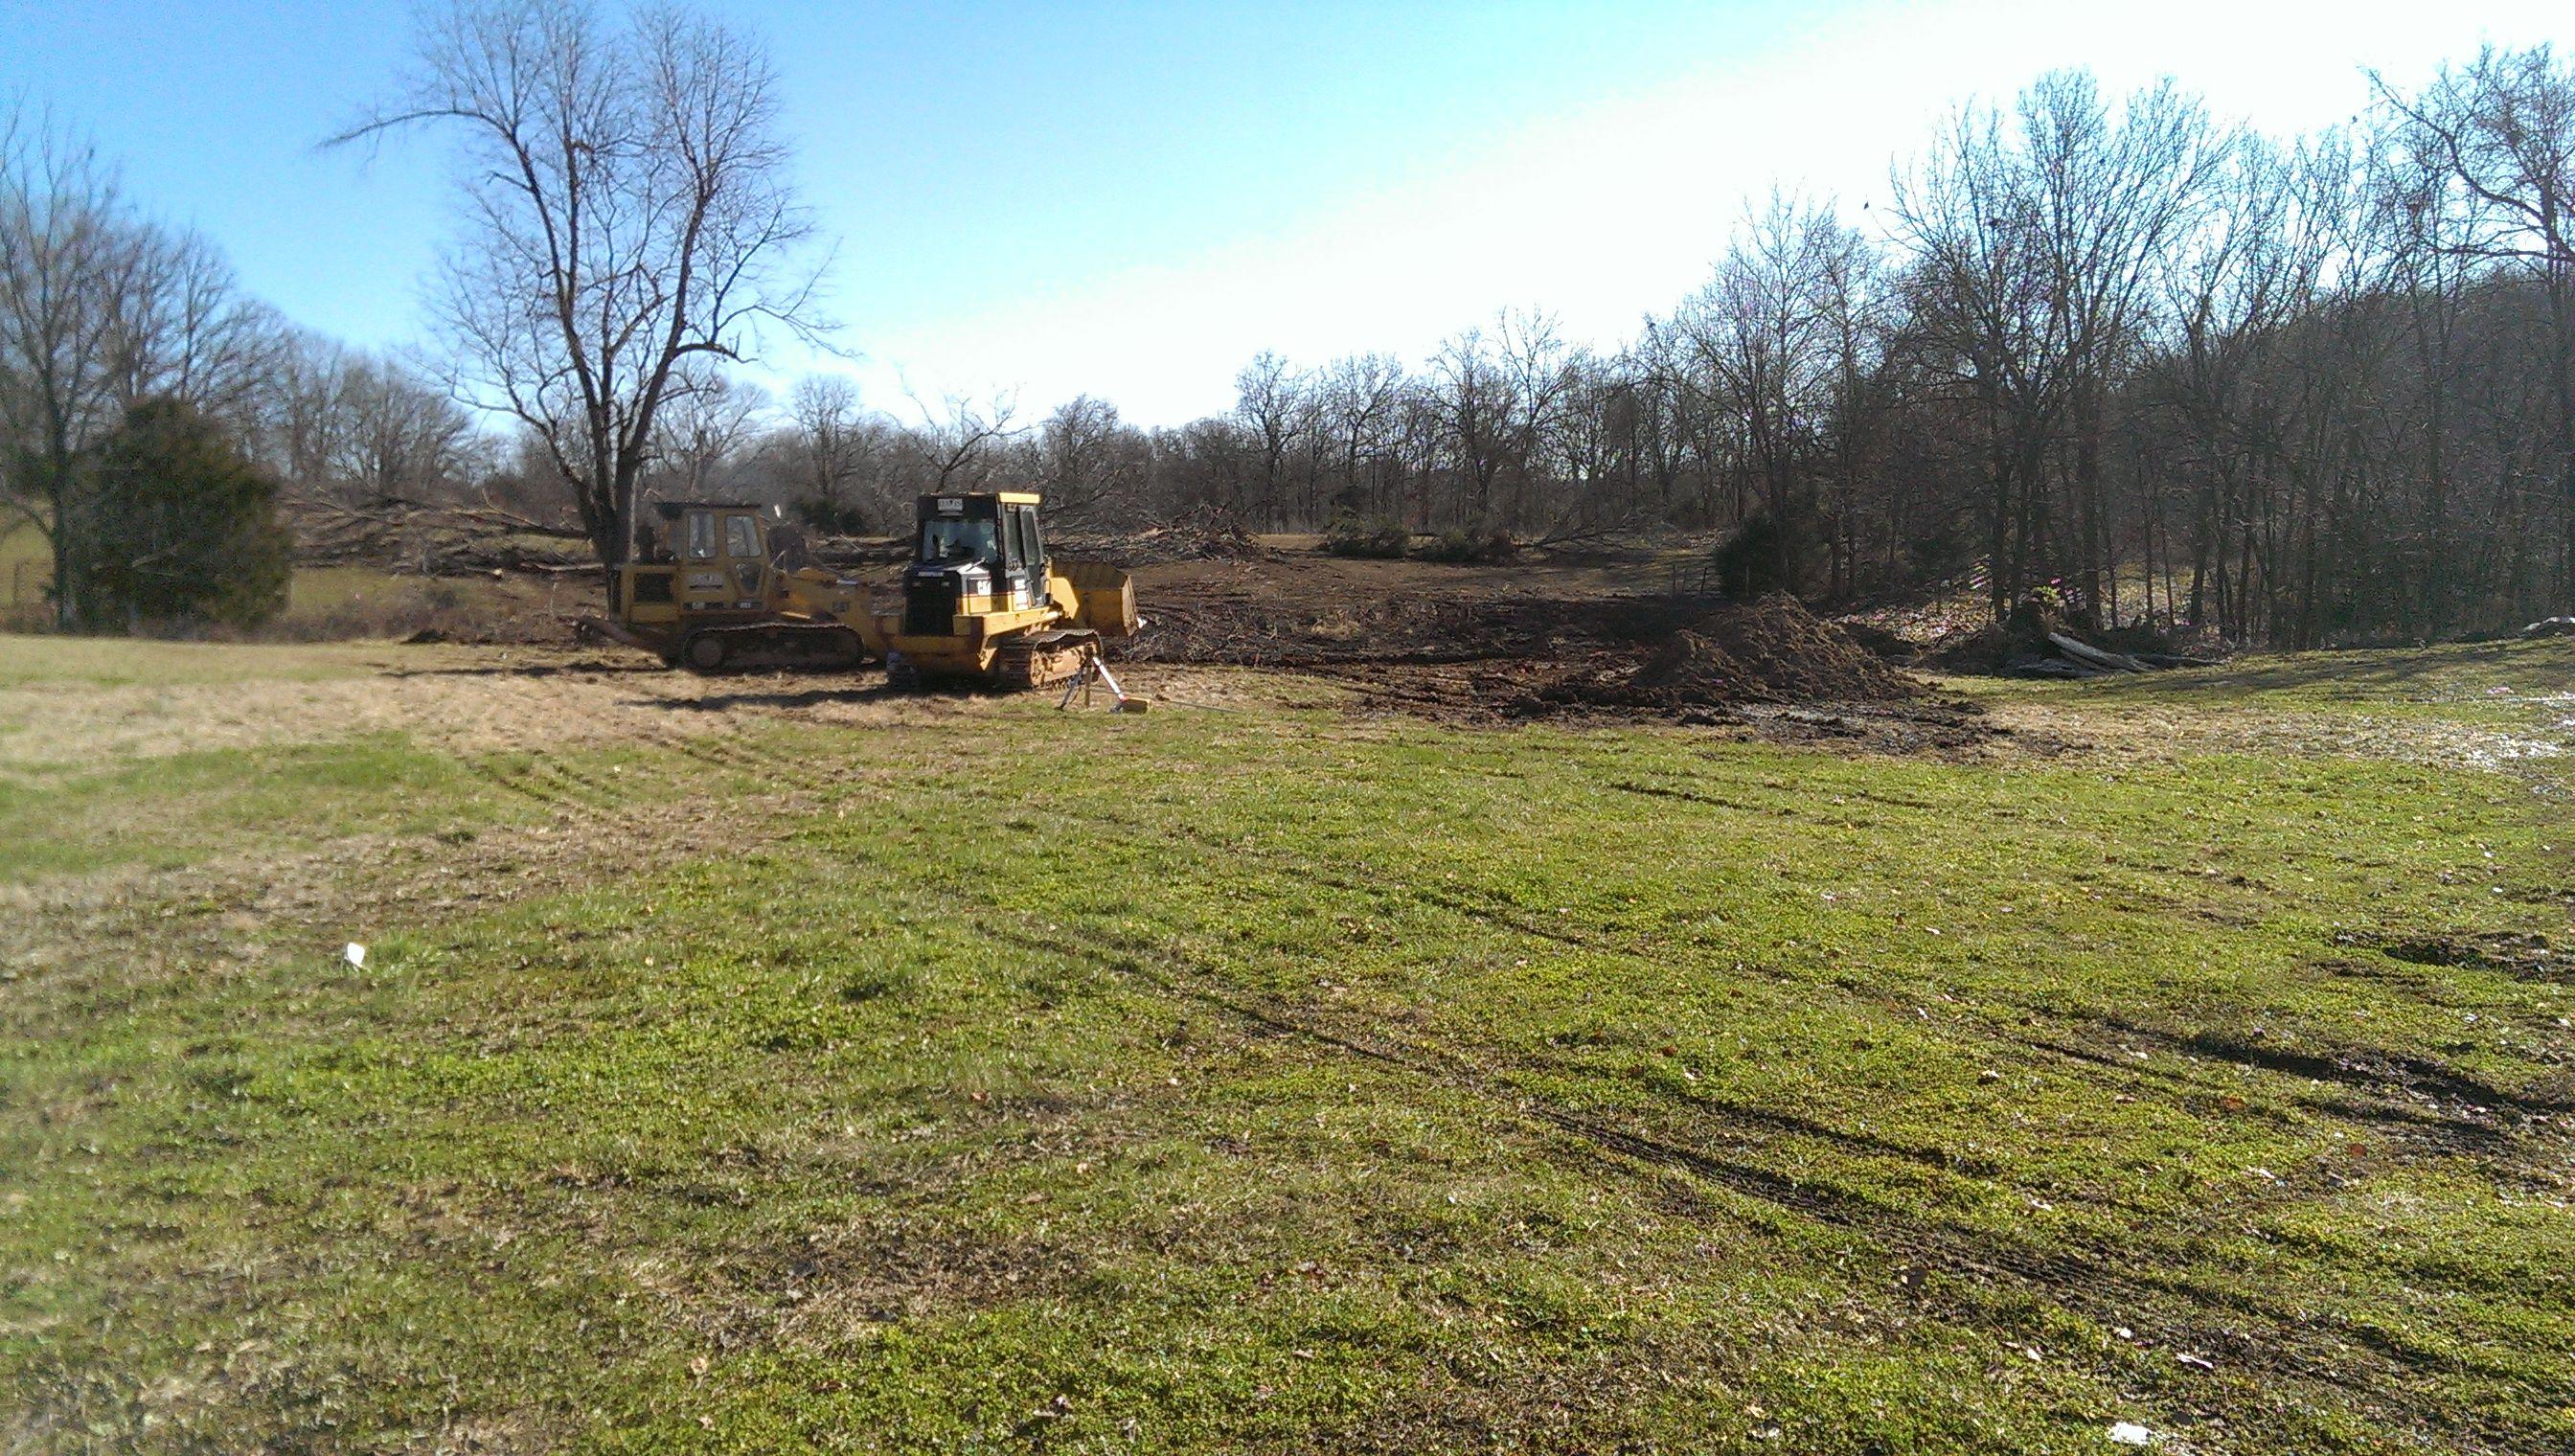 12/17/15 Digging my new pond